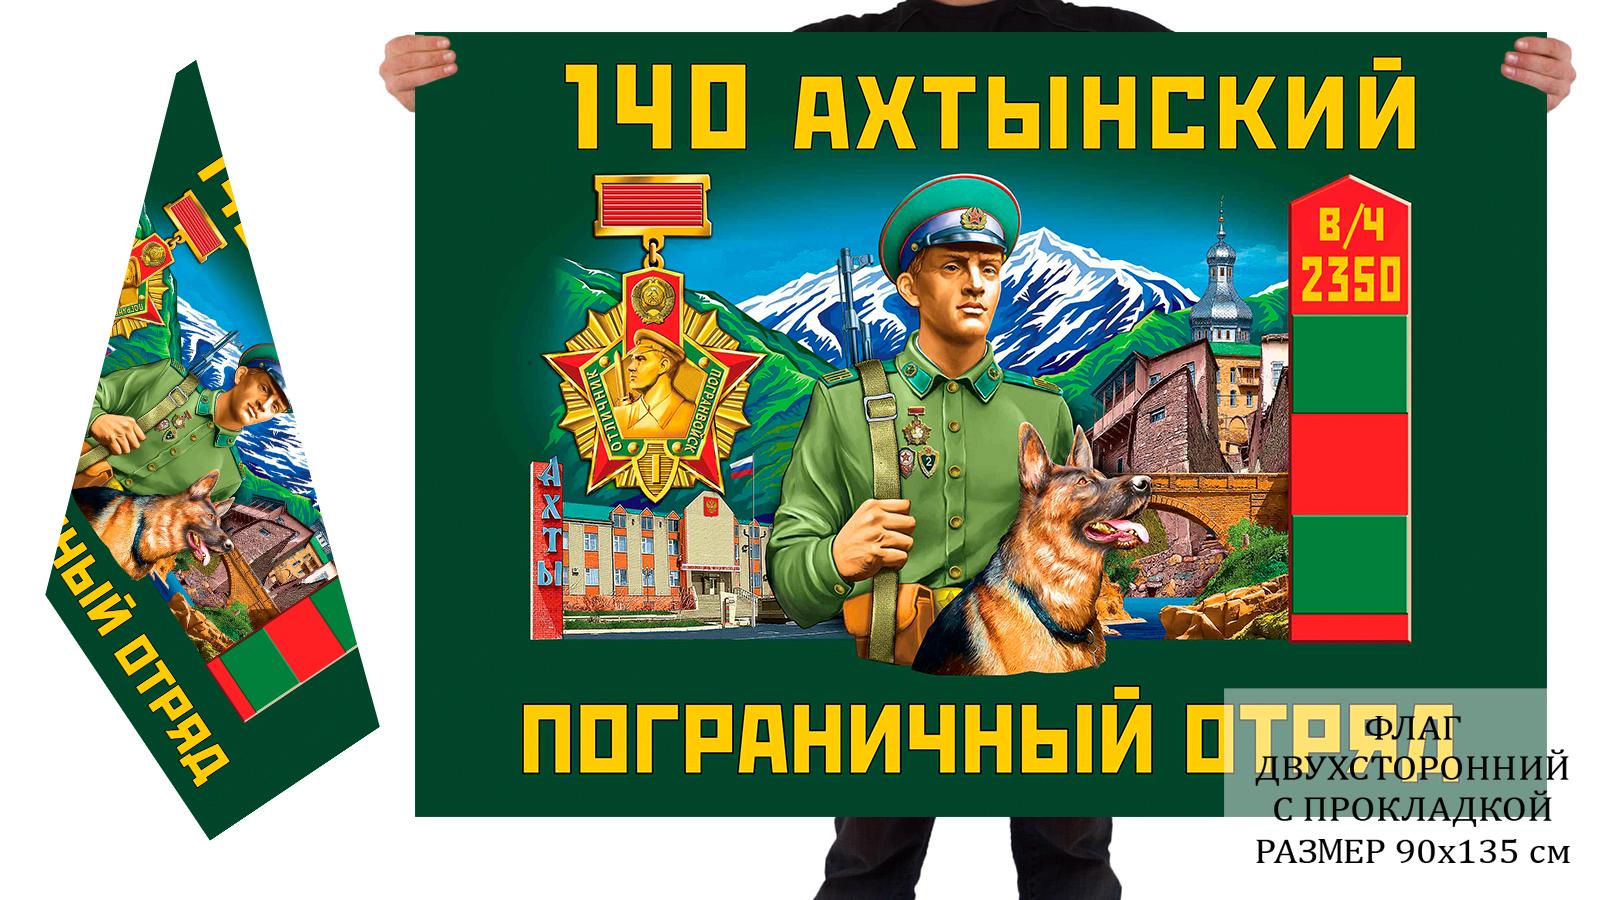 Двусторонний флаг 140 Ахтынского погранотряда